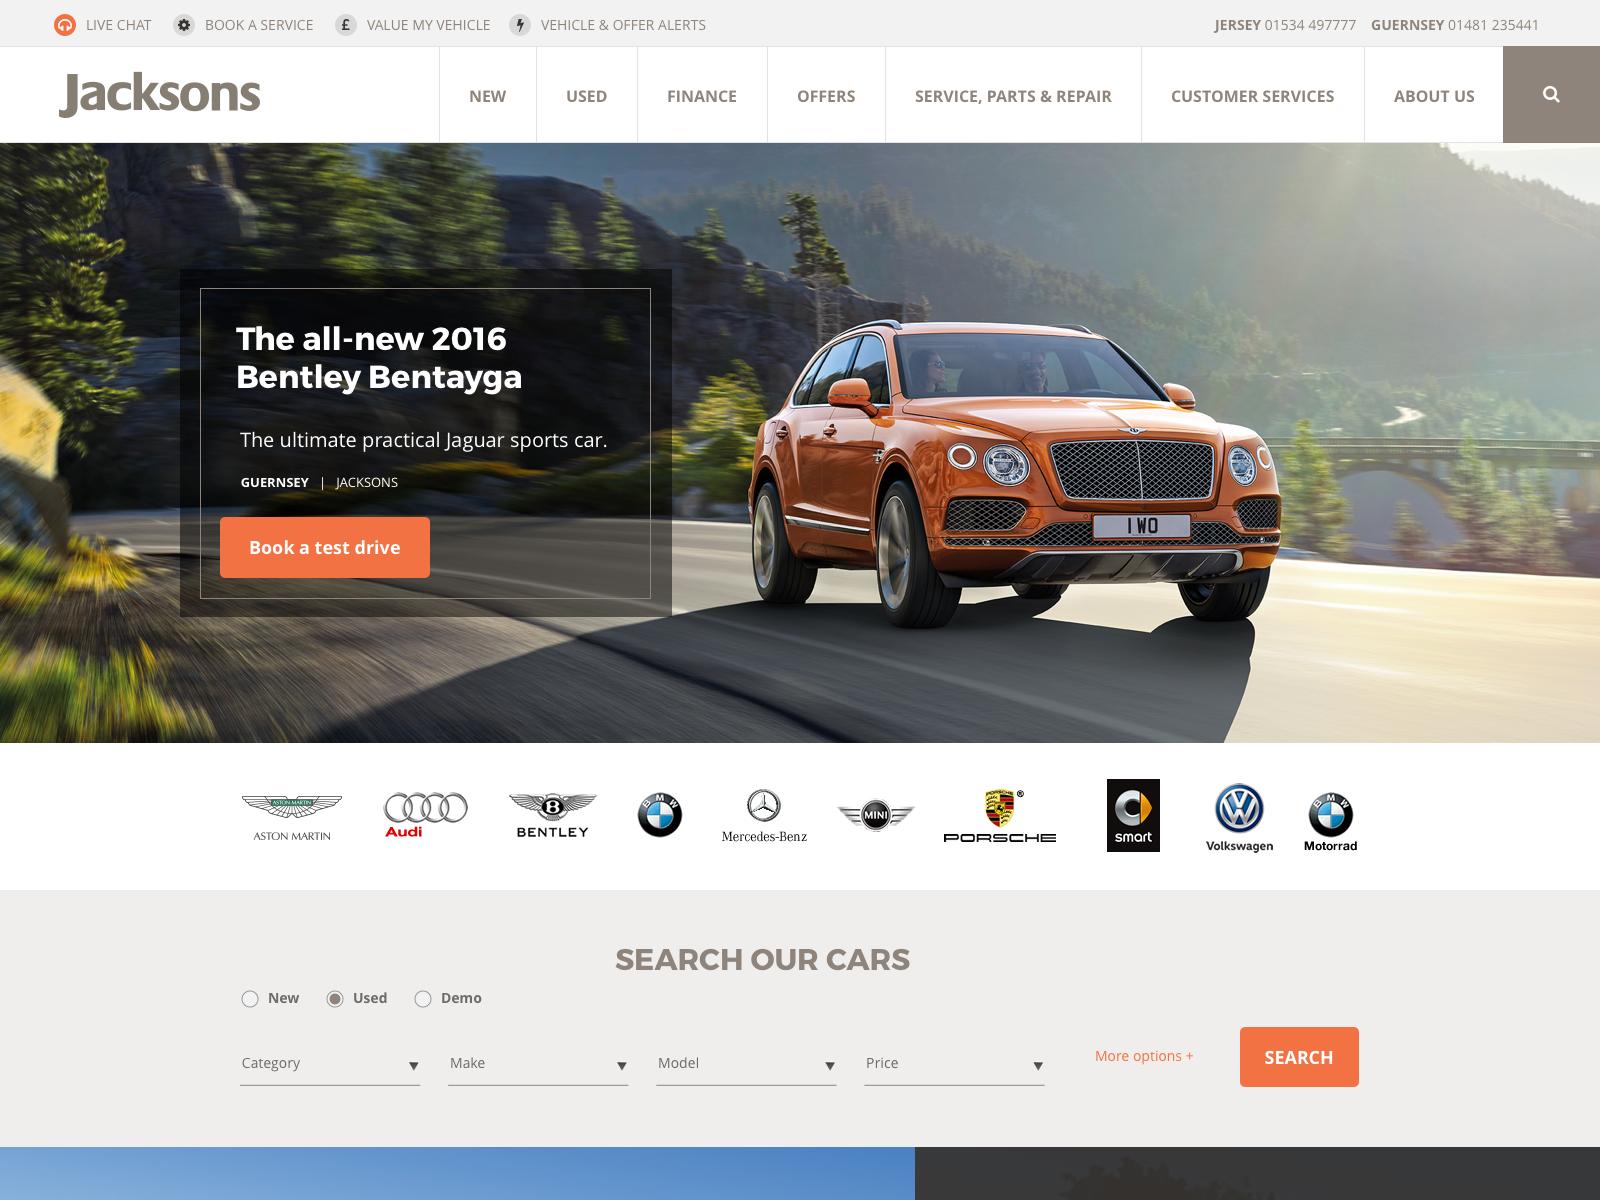 Auto Dealership Website Design Example #1